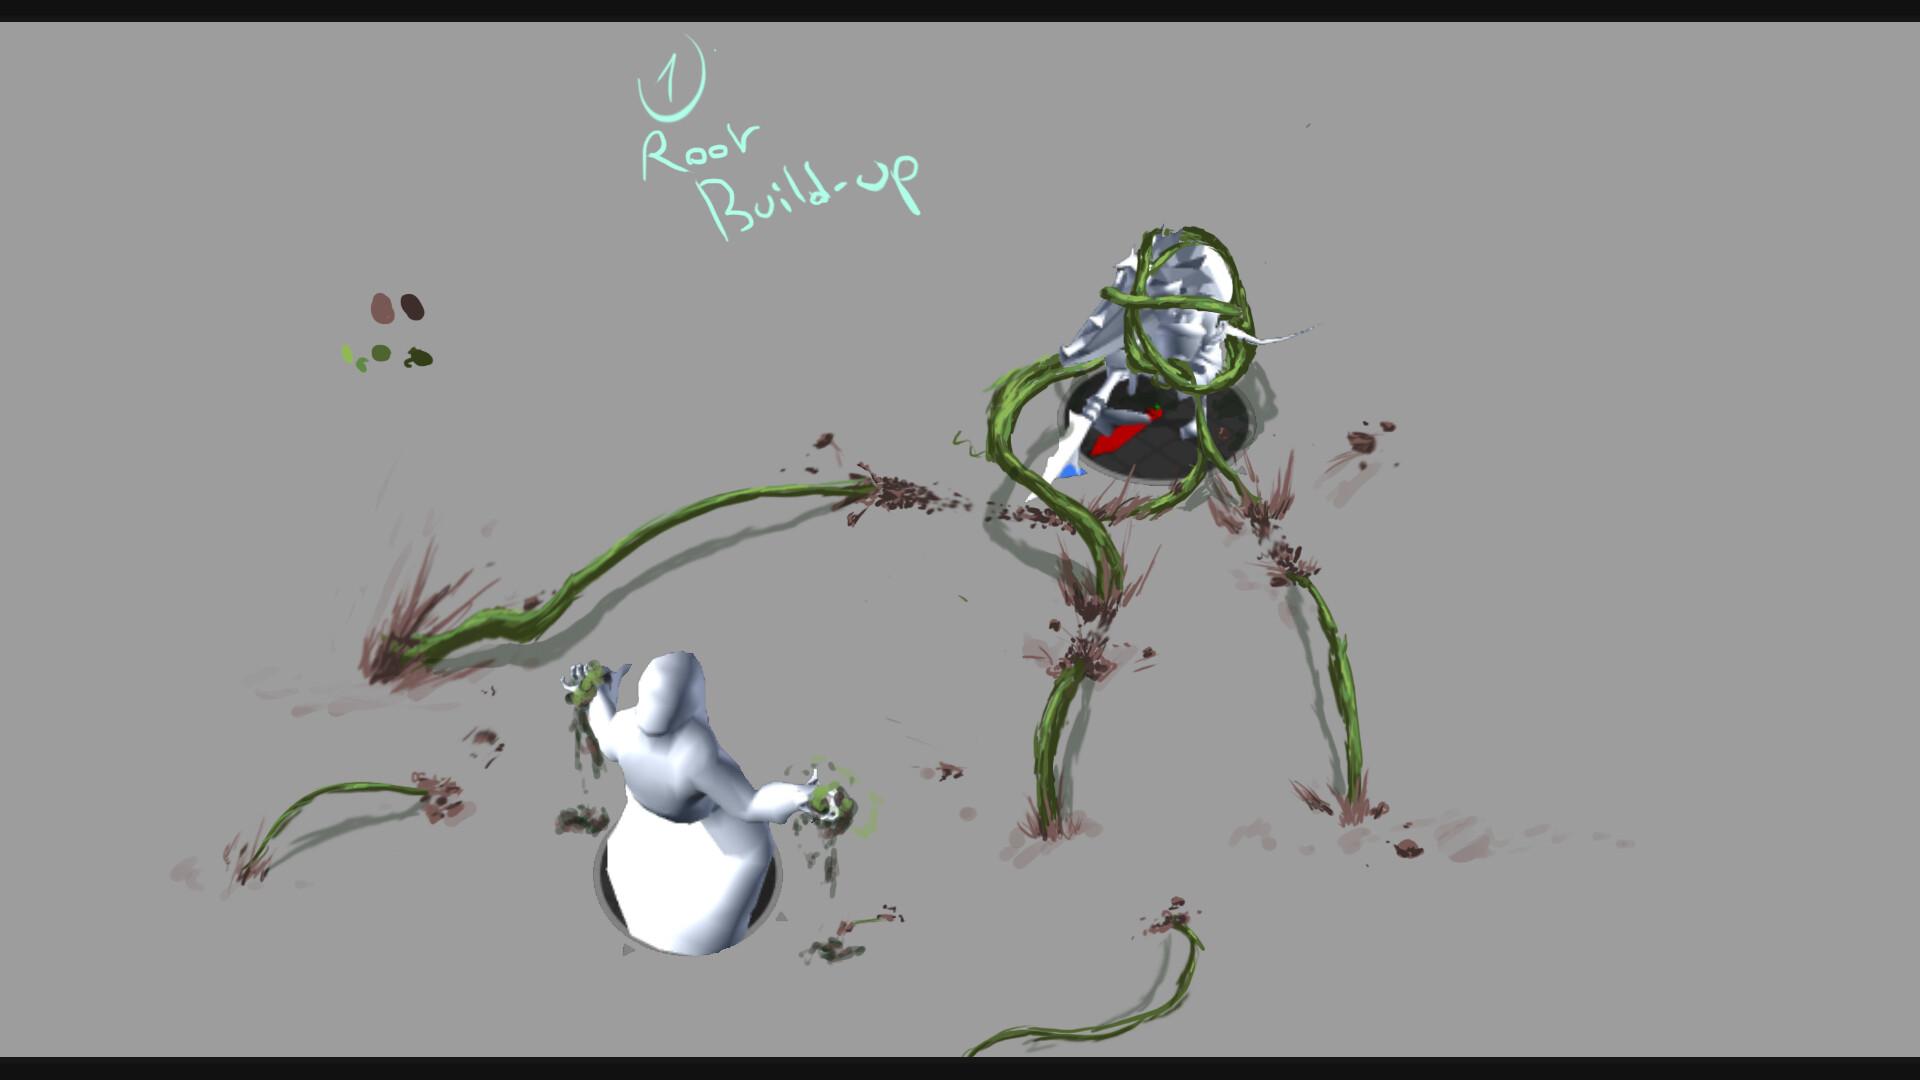 ArtStation - VFX Concept Arts, Assim Buyumad